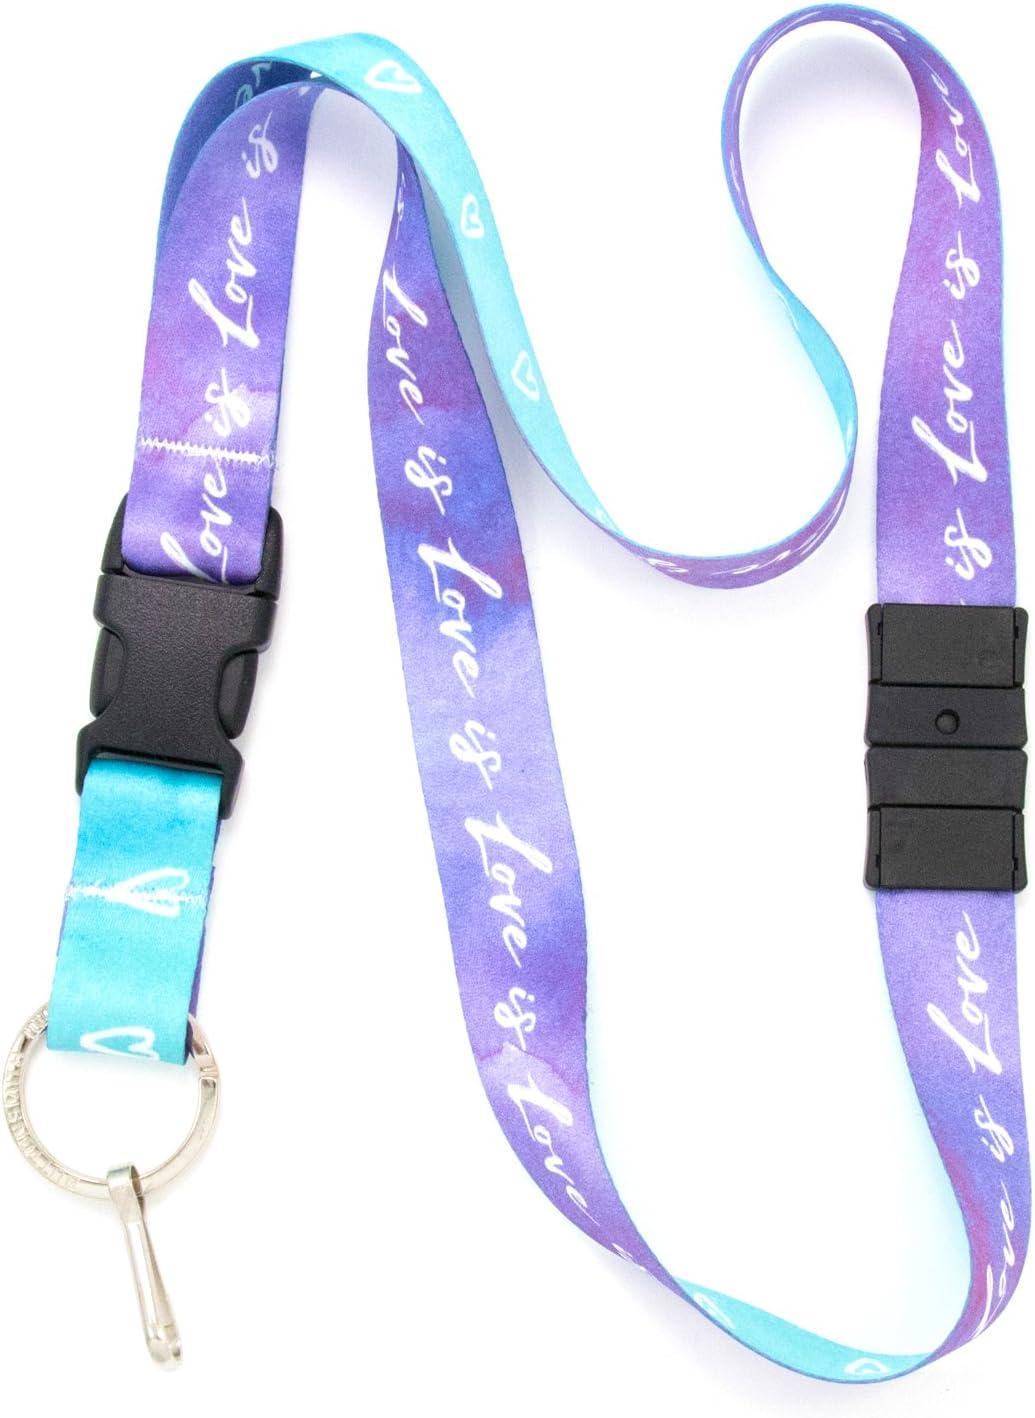 Personalize Customize Monogram Breakaway Heavy Duable Fabric and Webbing Lanyard